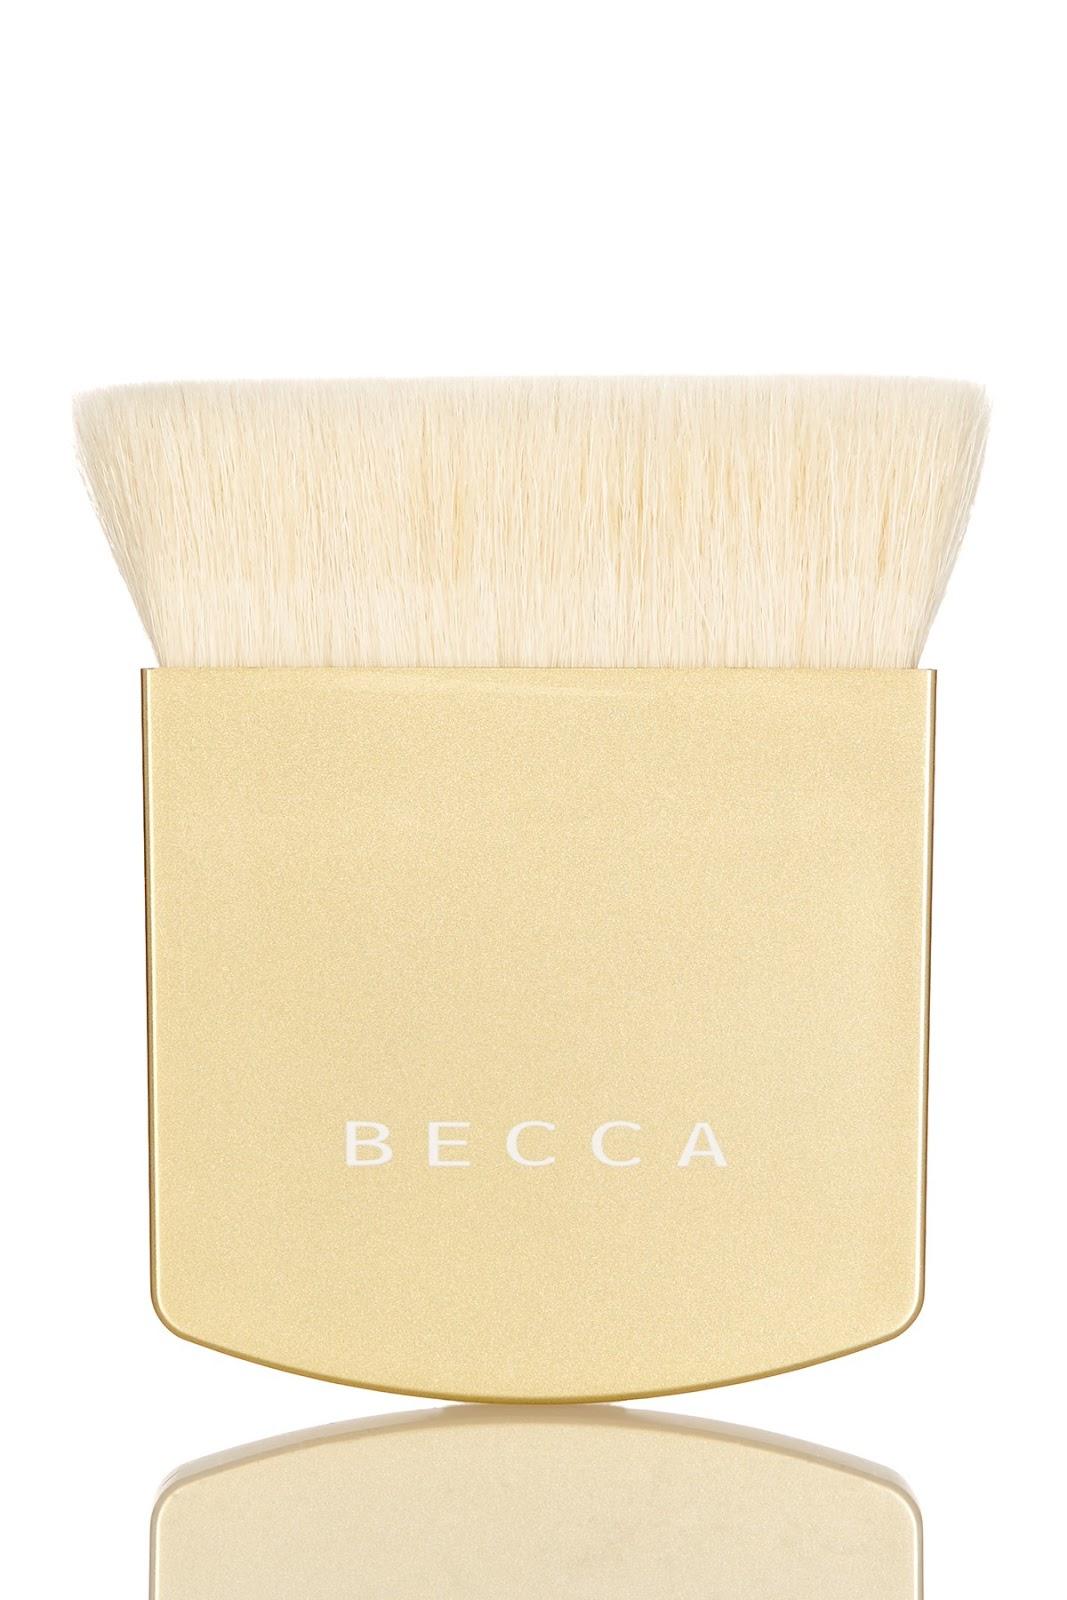 Becca Cosmetics on Hautelook.com